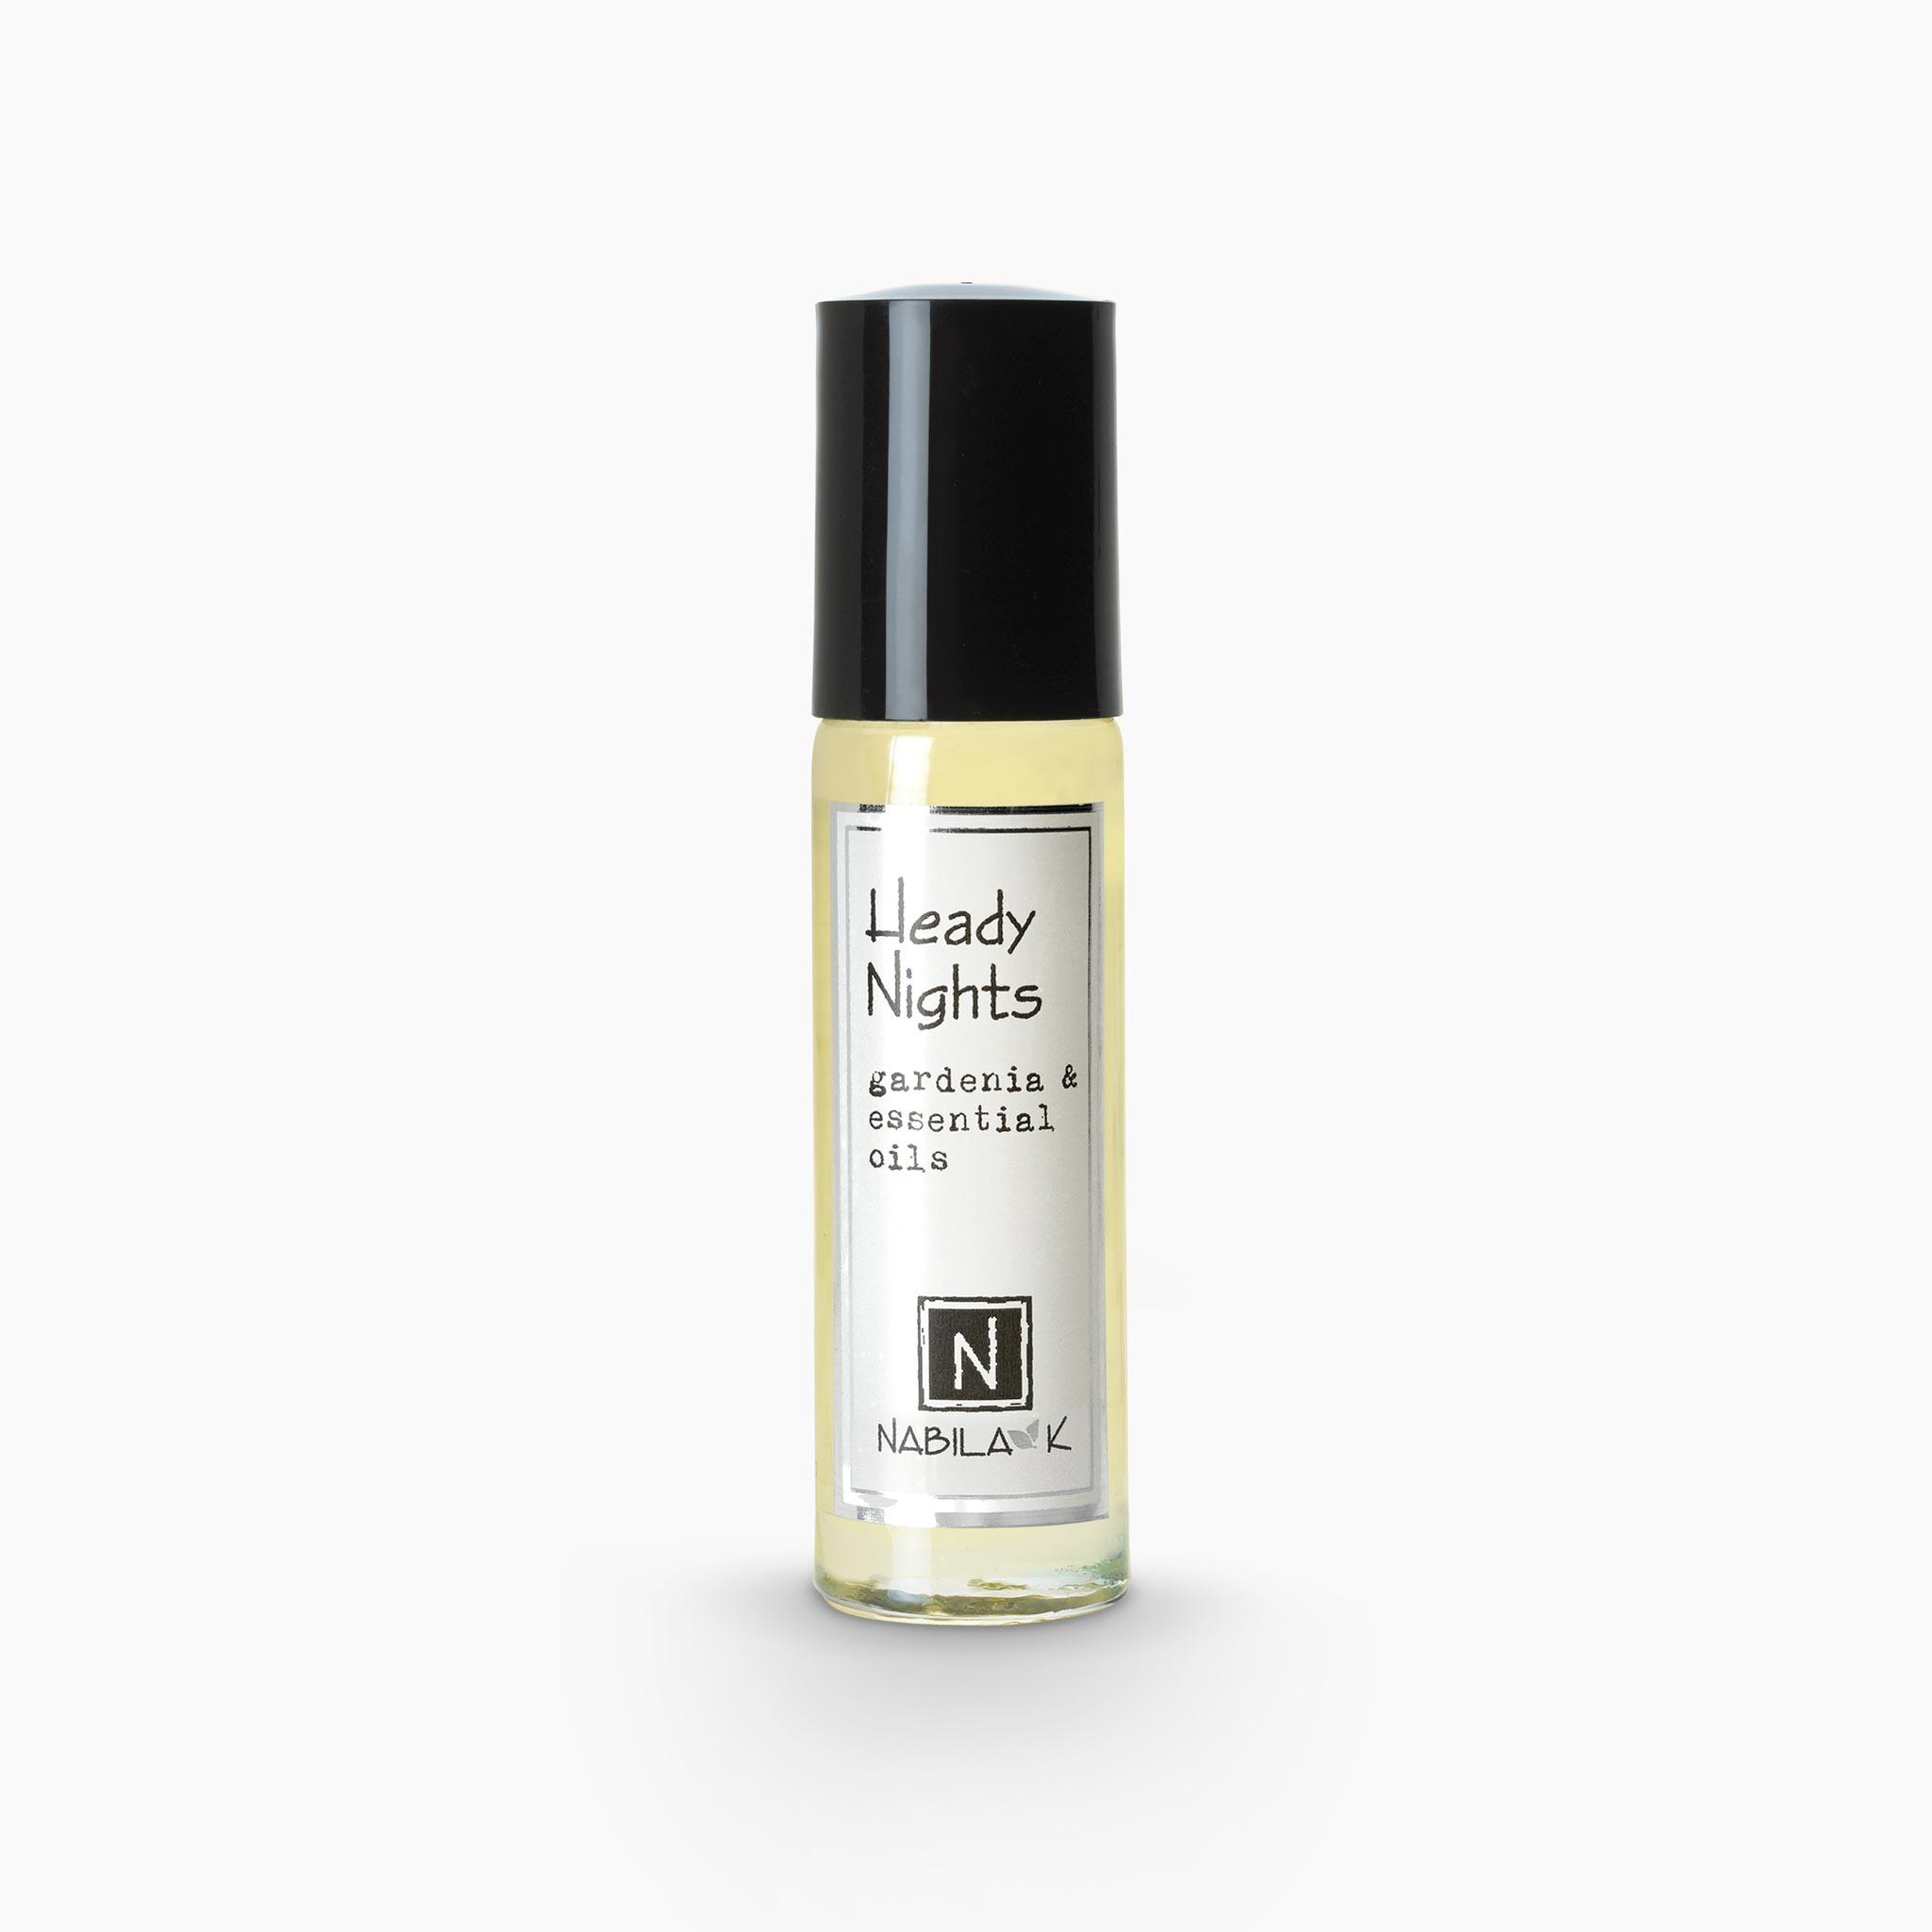 .33oz of Nabila K's Heady Nights Gardenia and Essential Oils Roll on Perfume